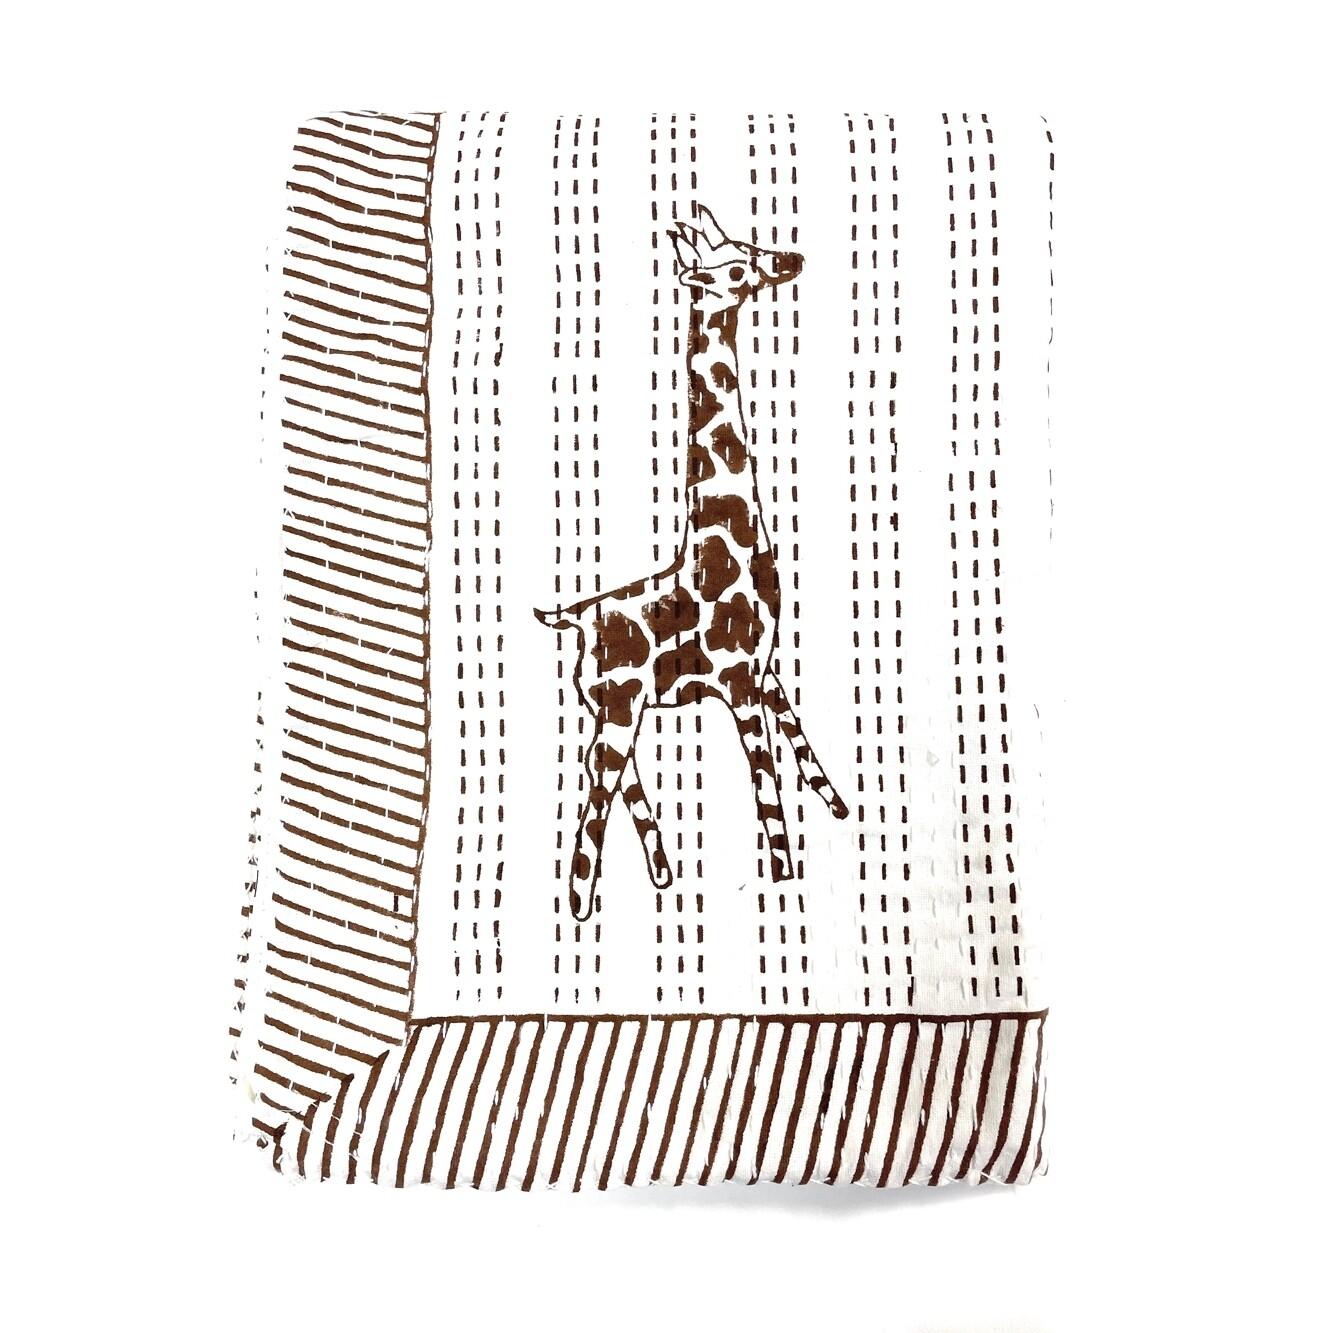 Block Printed Kantha Quilt - Giraffe